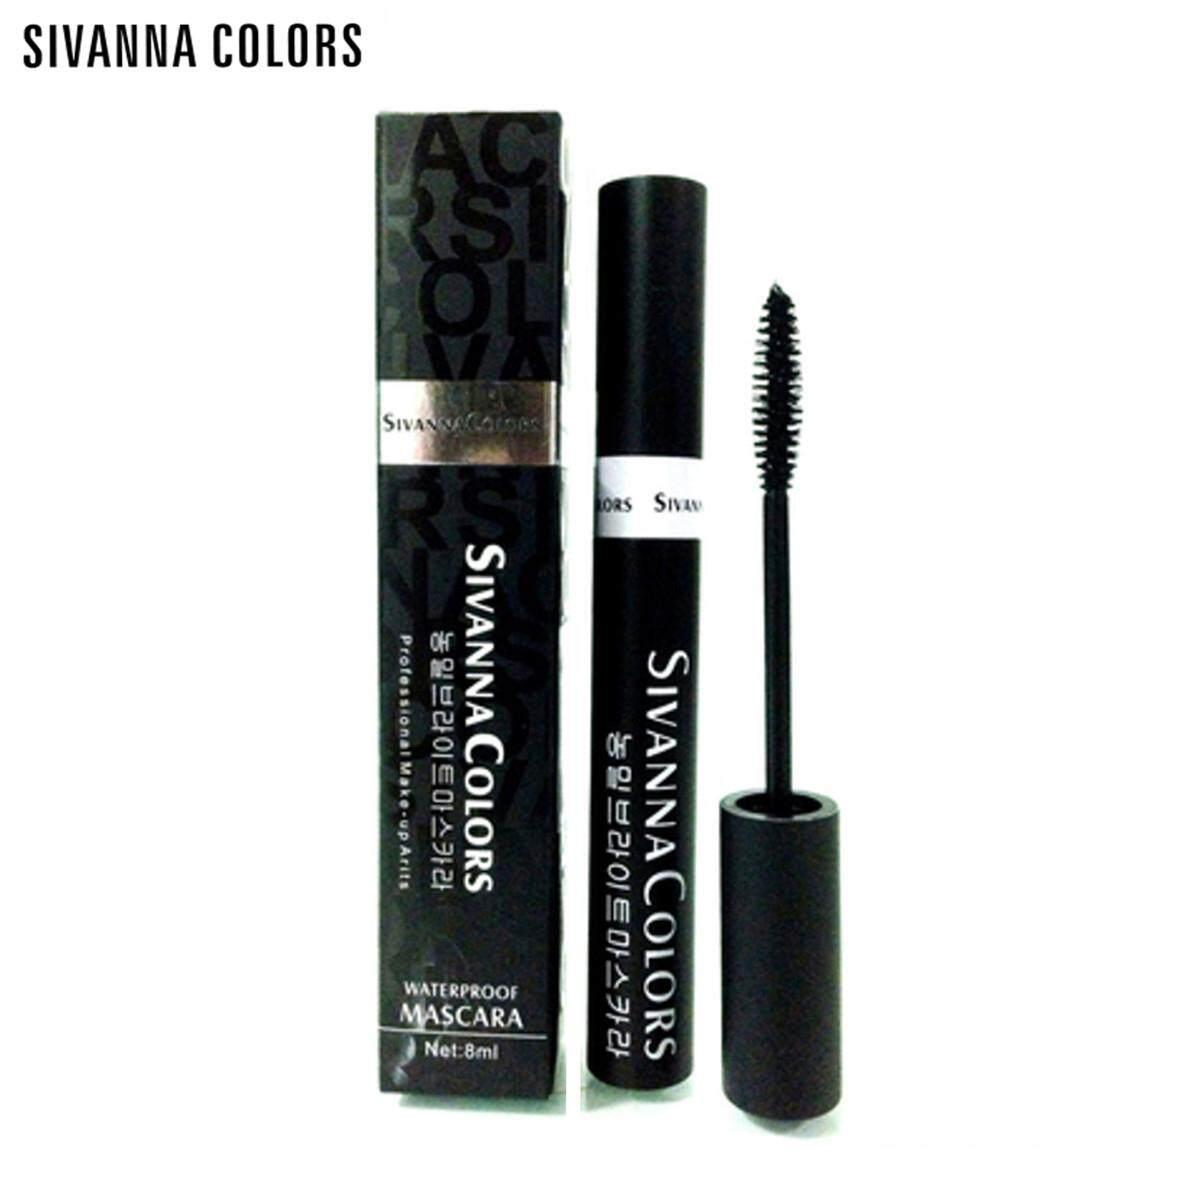 Sivanna Colors Waterpoof Mascara 1 ชิ้น